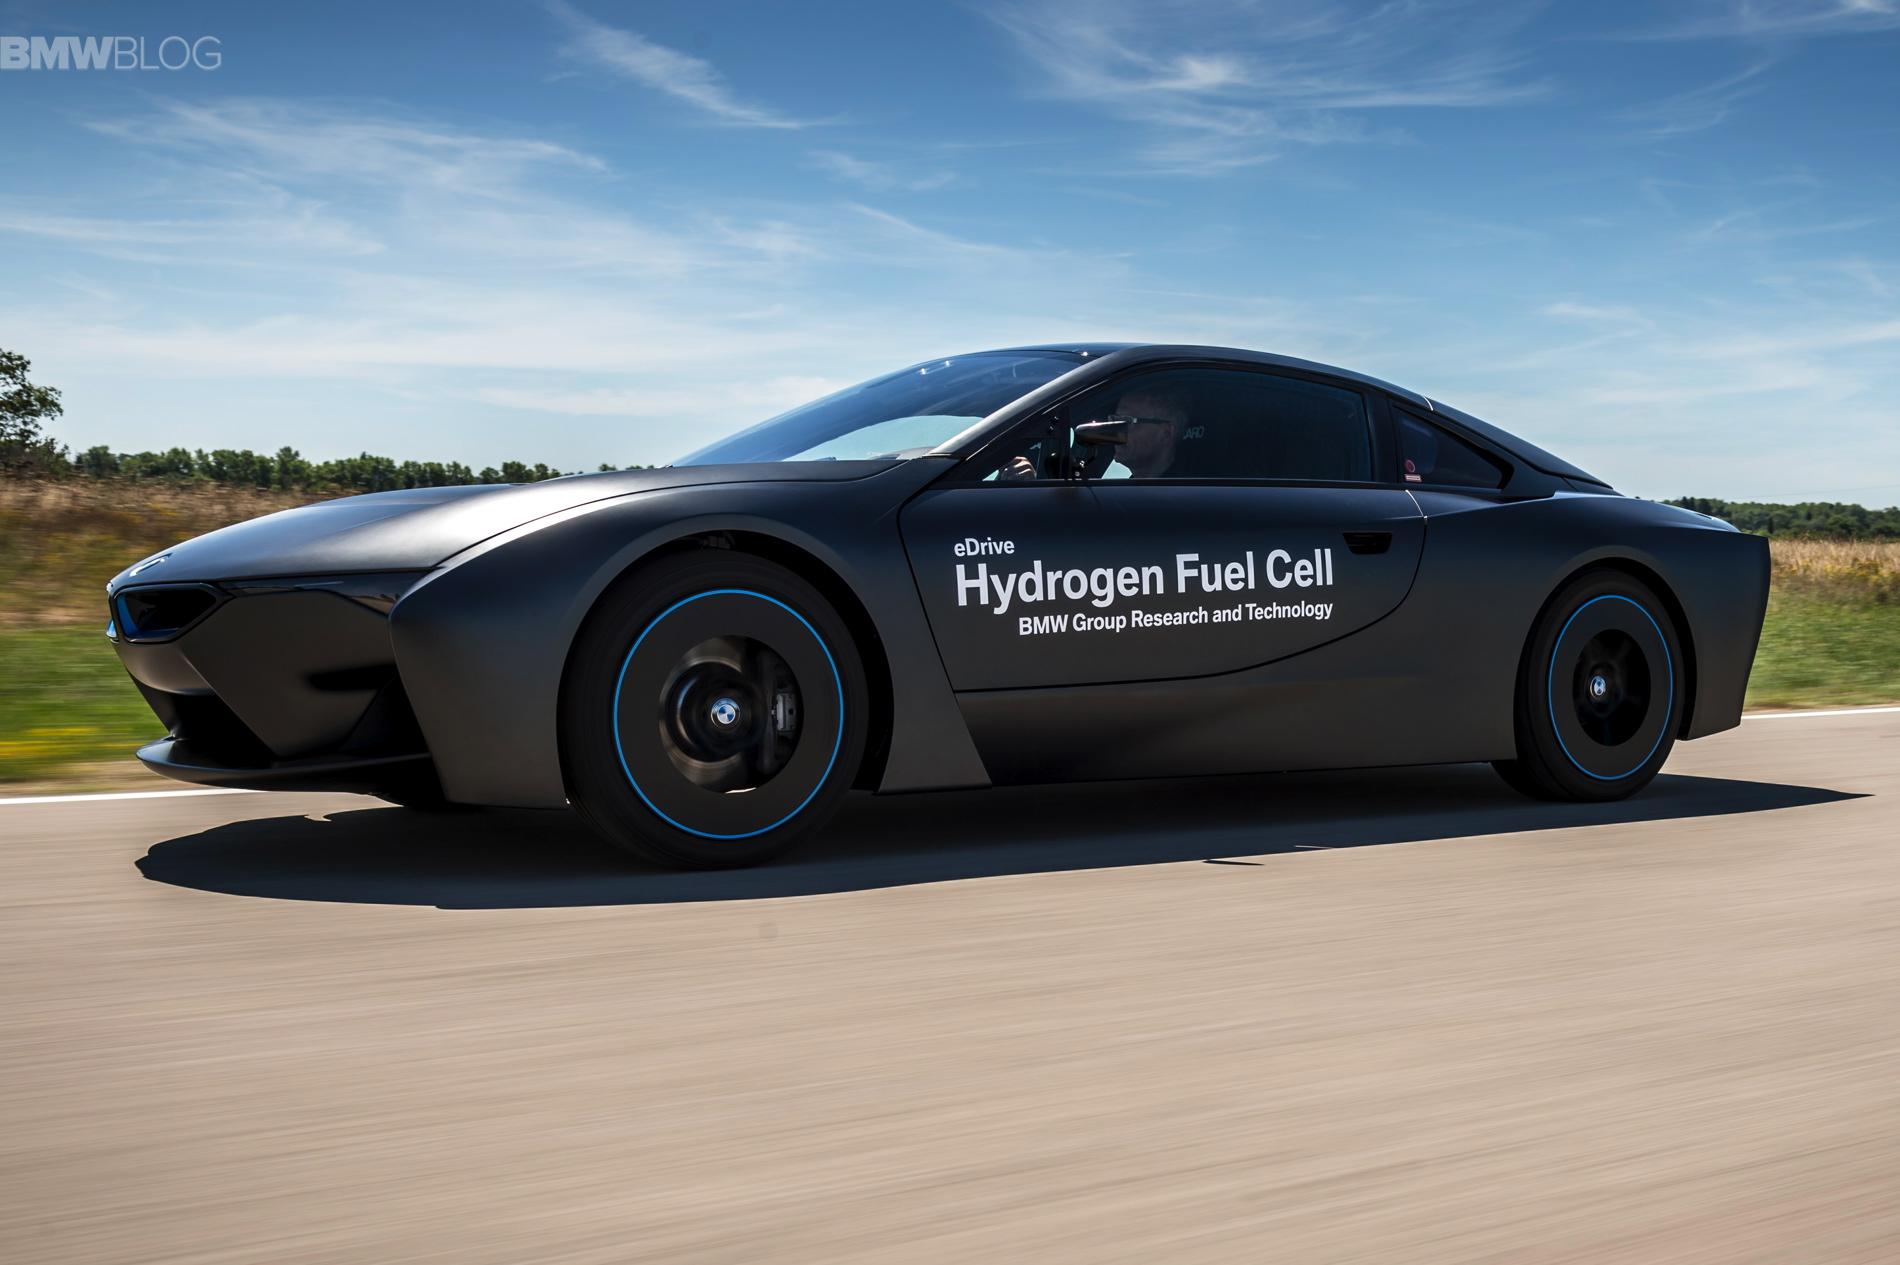 BMW i8 hydrogen fuel cell images 04